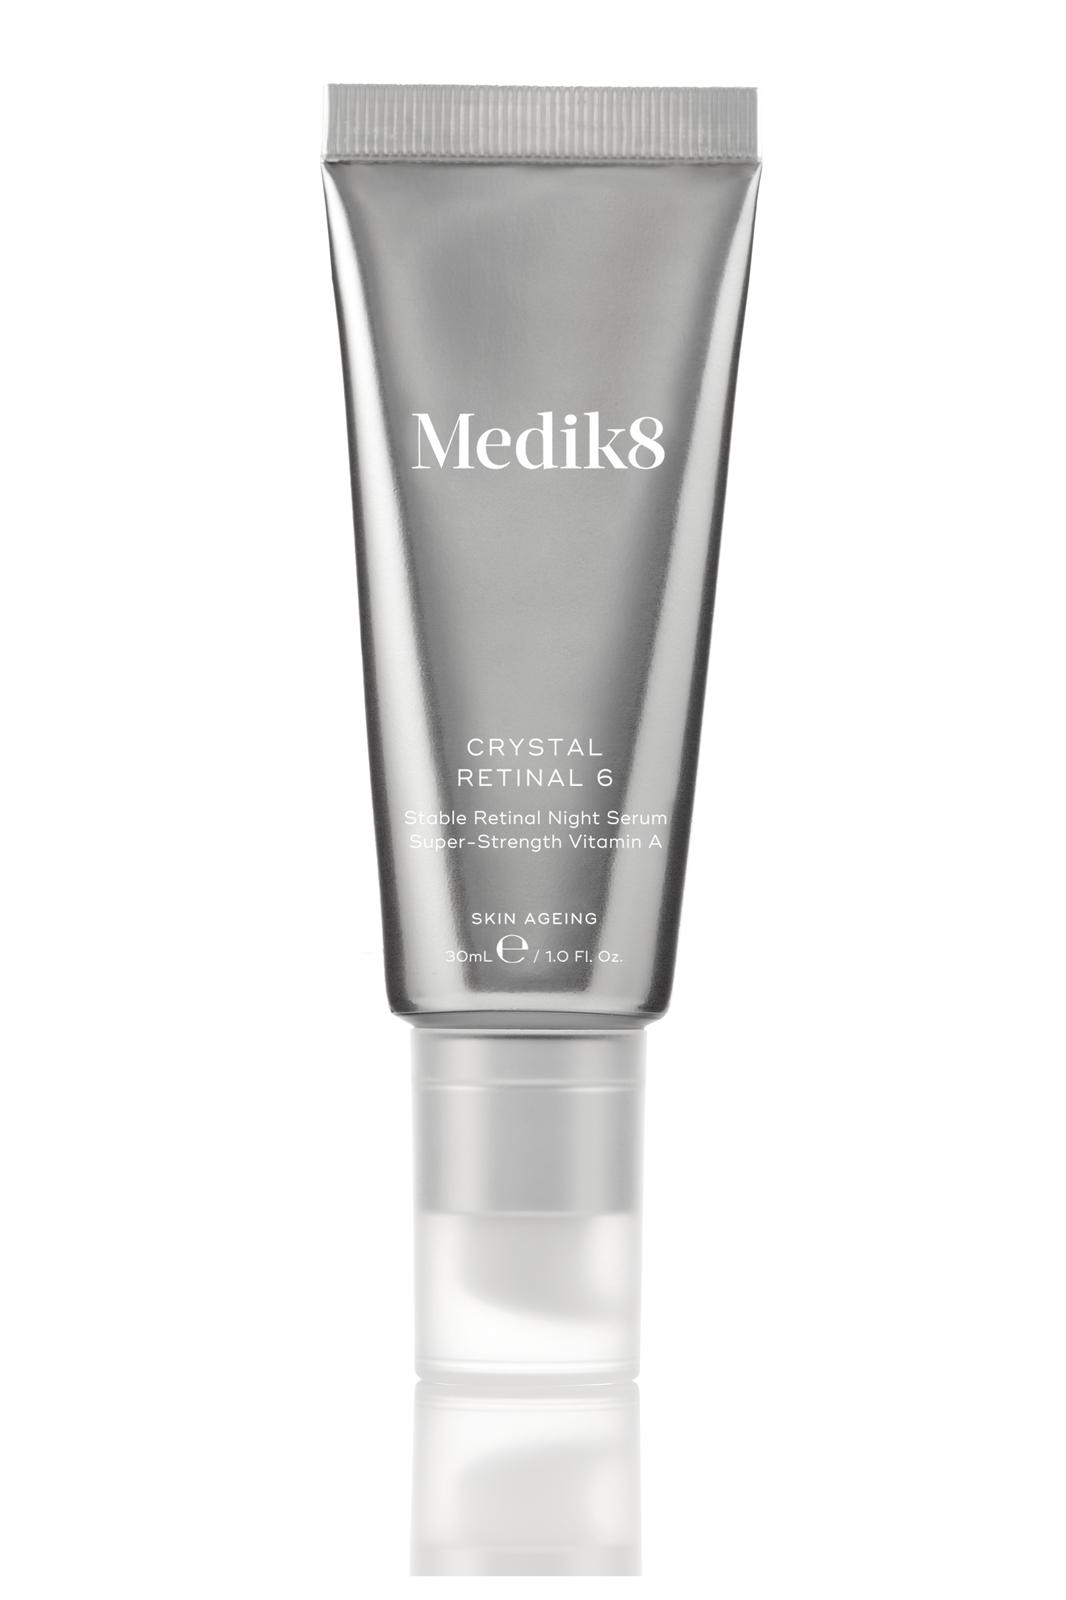 Medik8 - Crystal Retinal 6